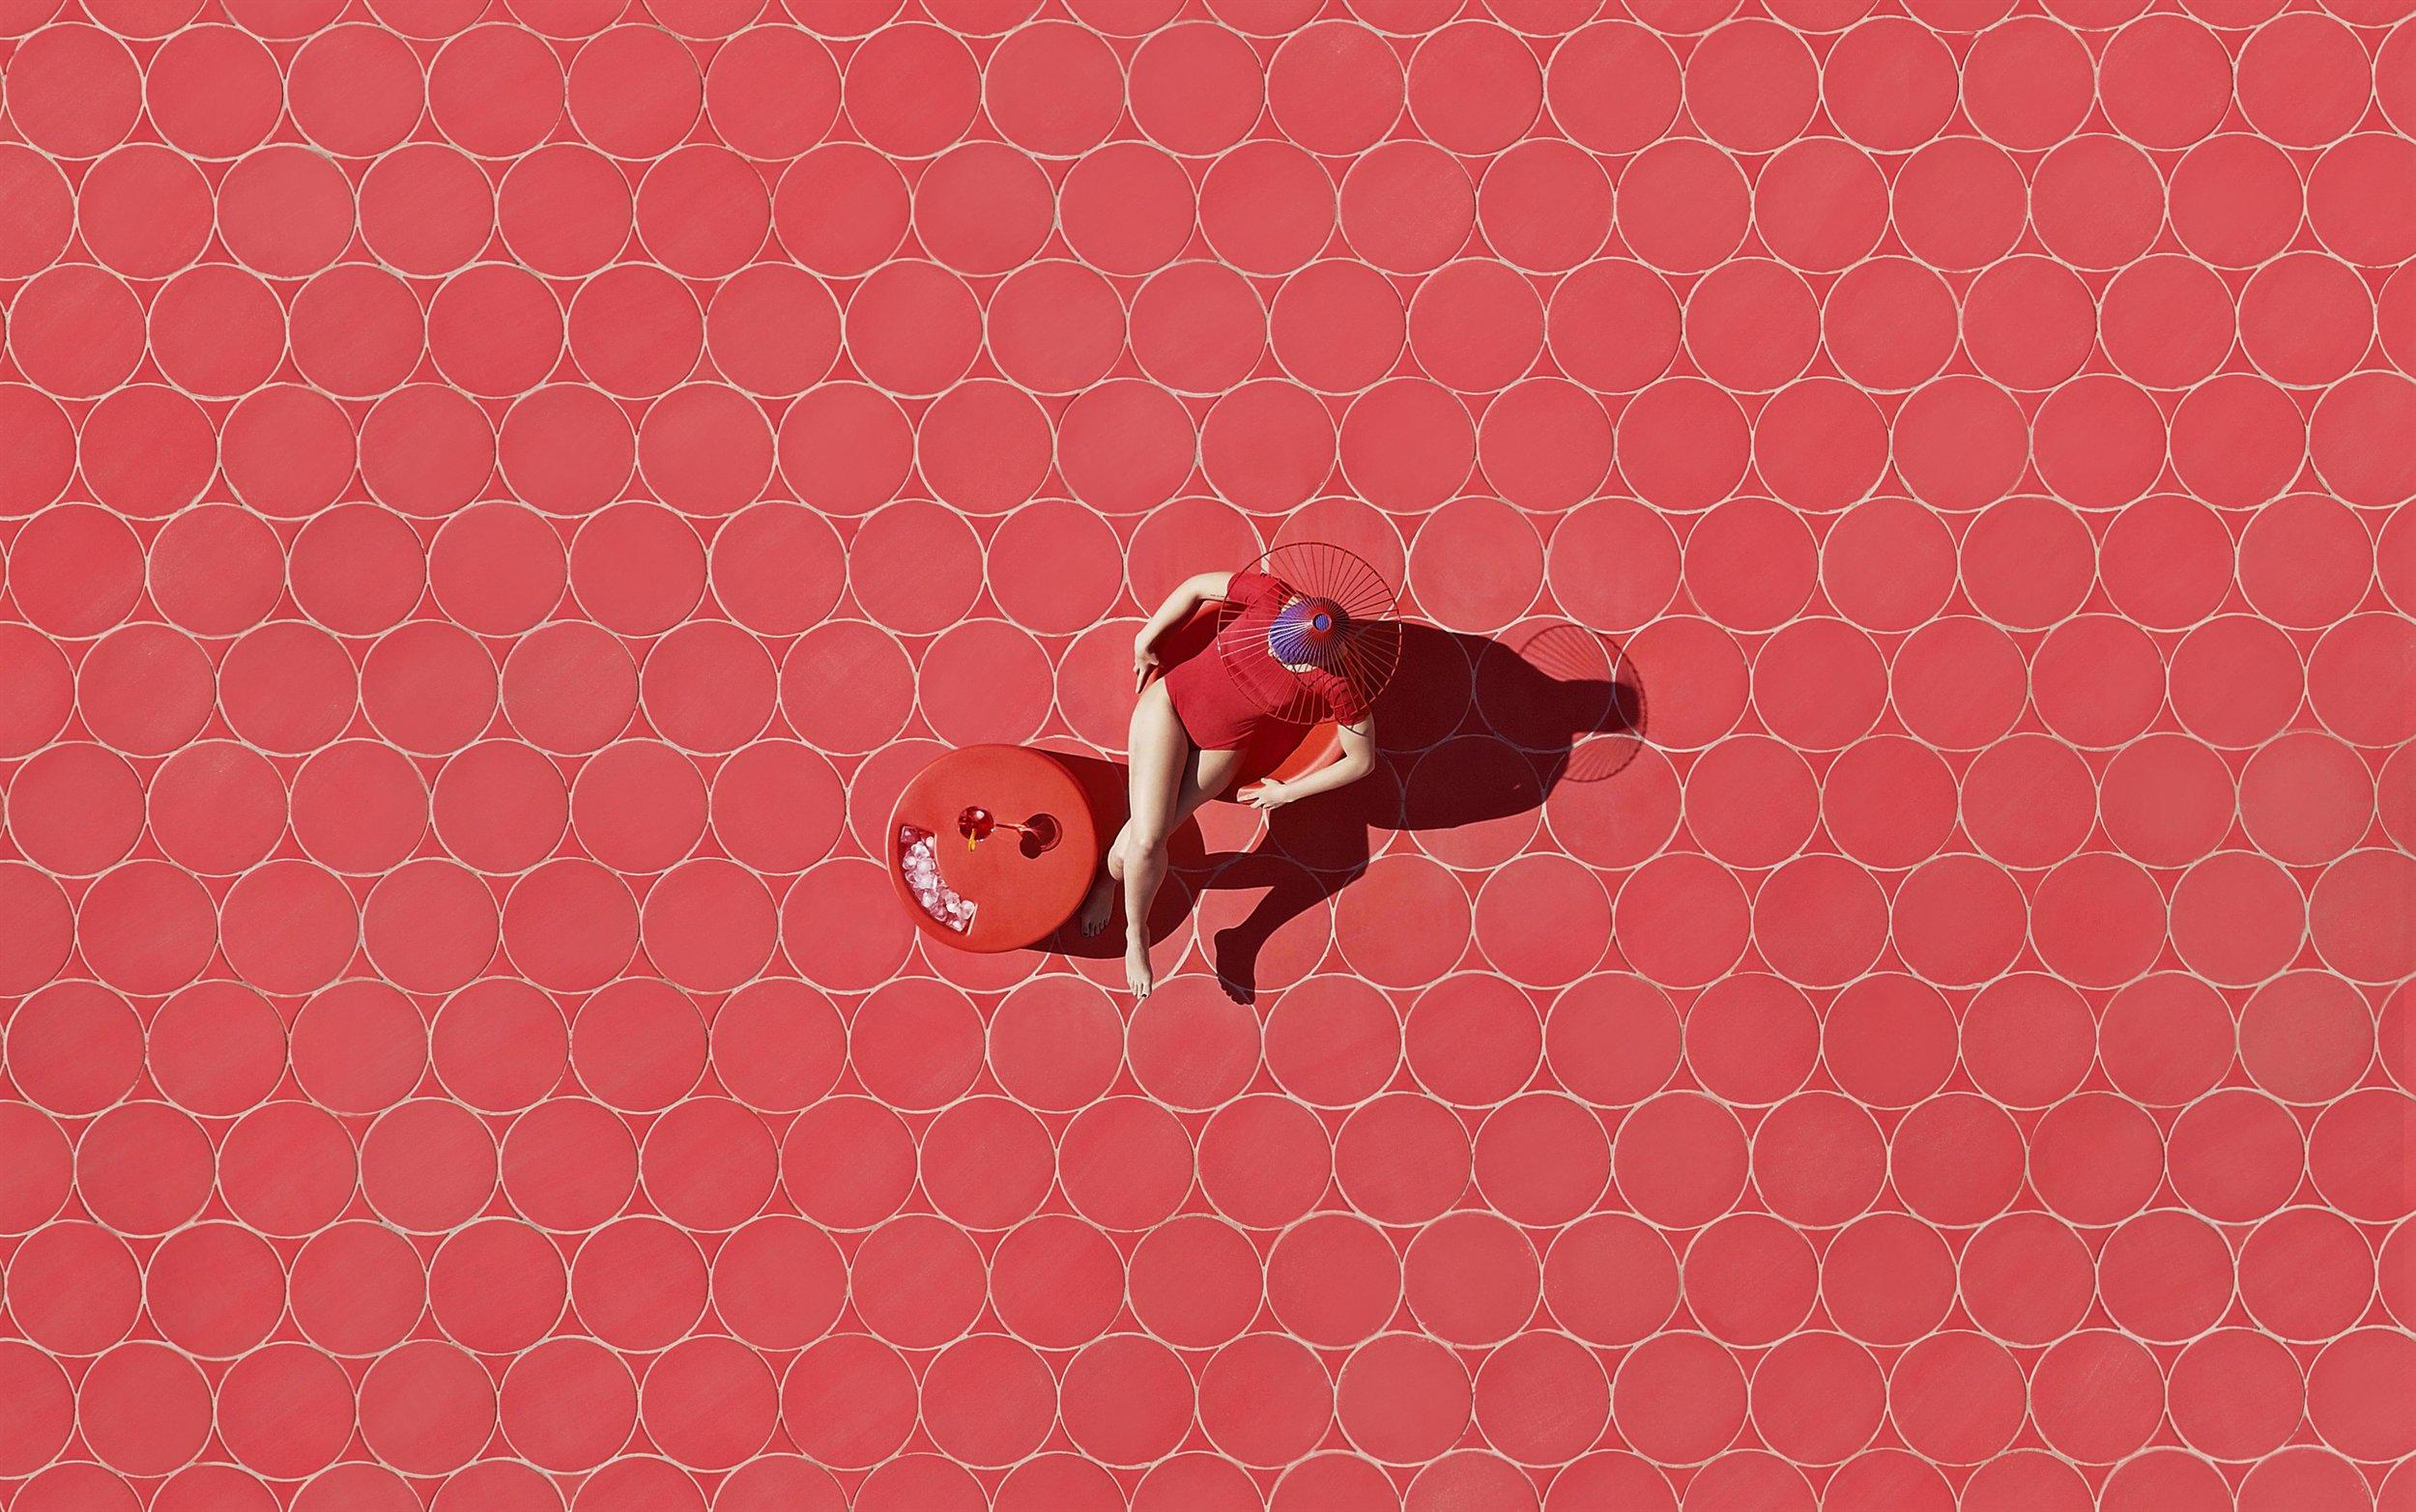 Suelo rojo_chica.jpg